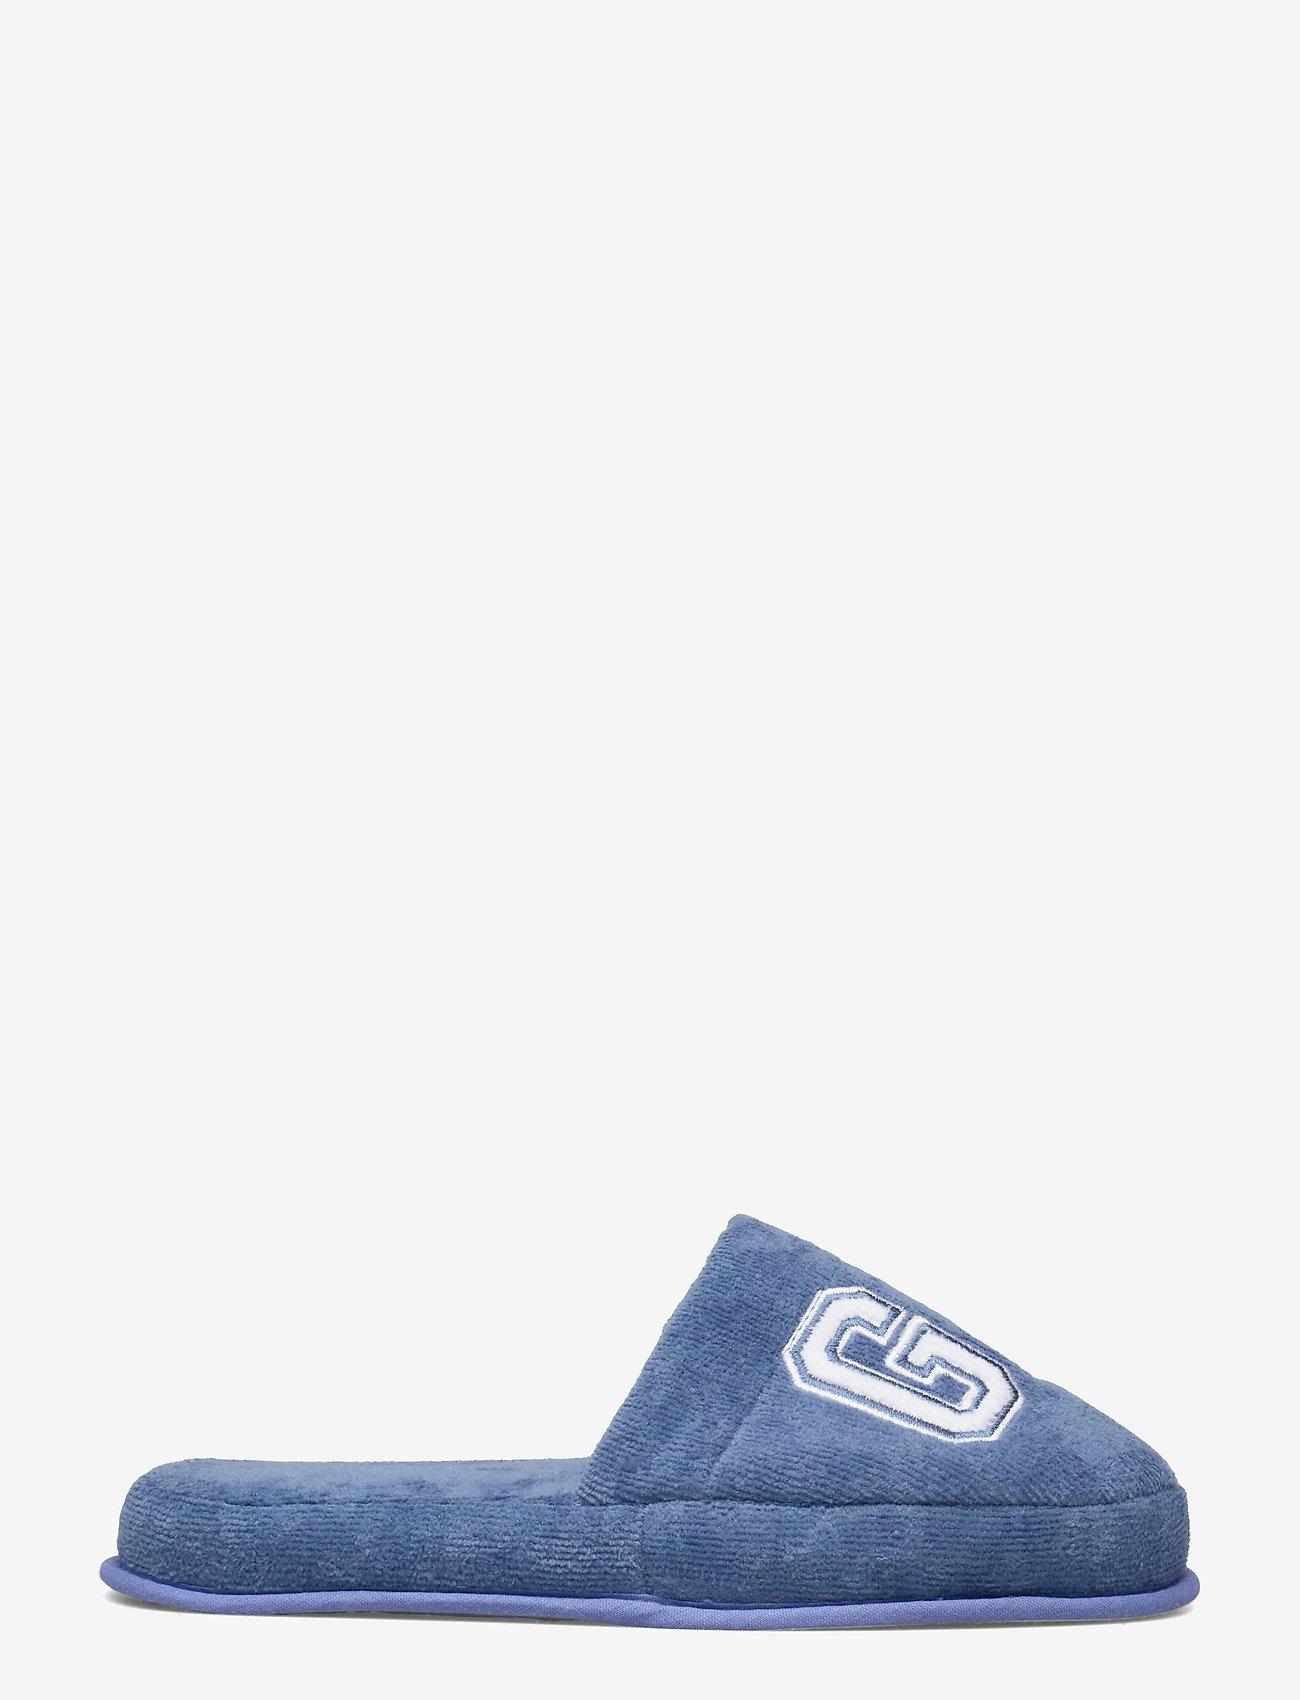 GANT - VACAY SLIPPERS - odzież - moonlight blue - 1